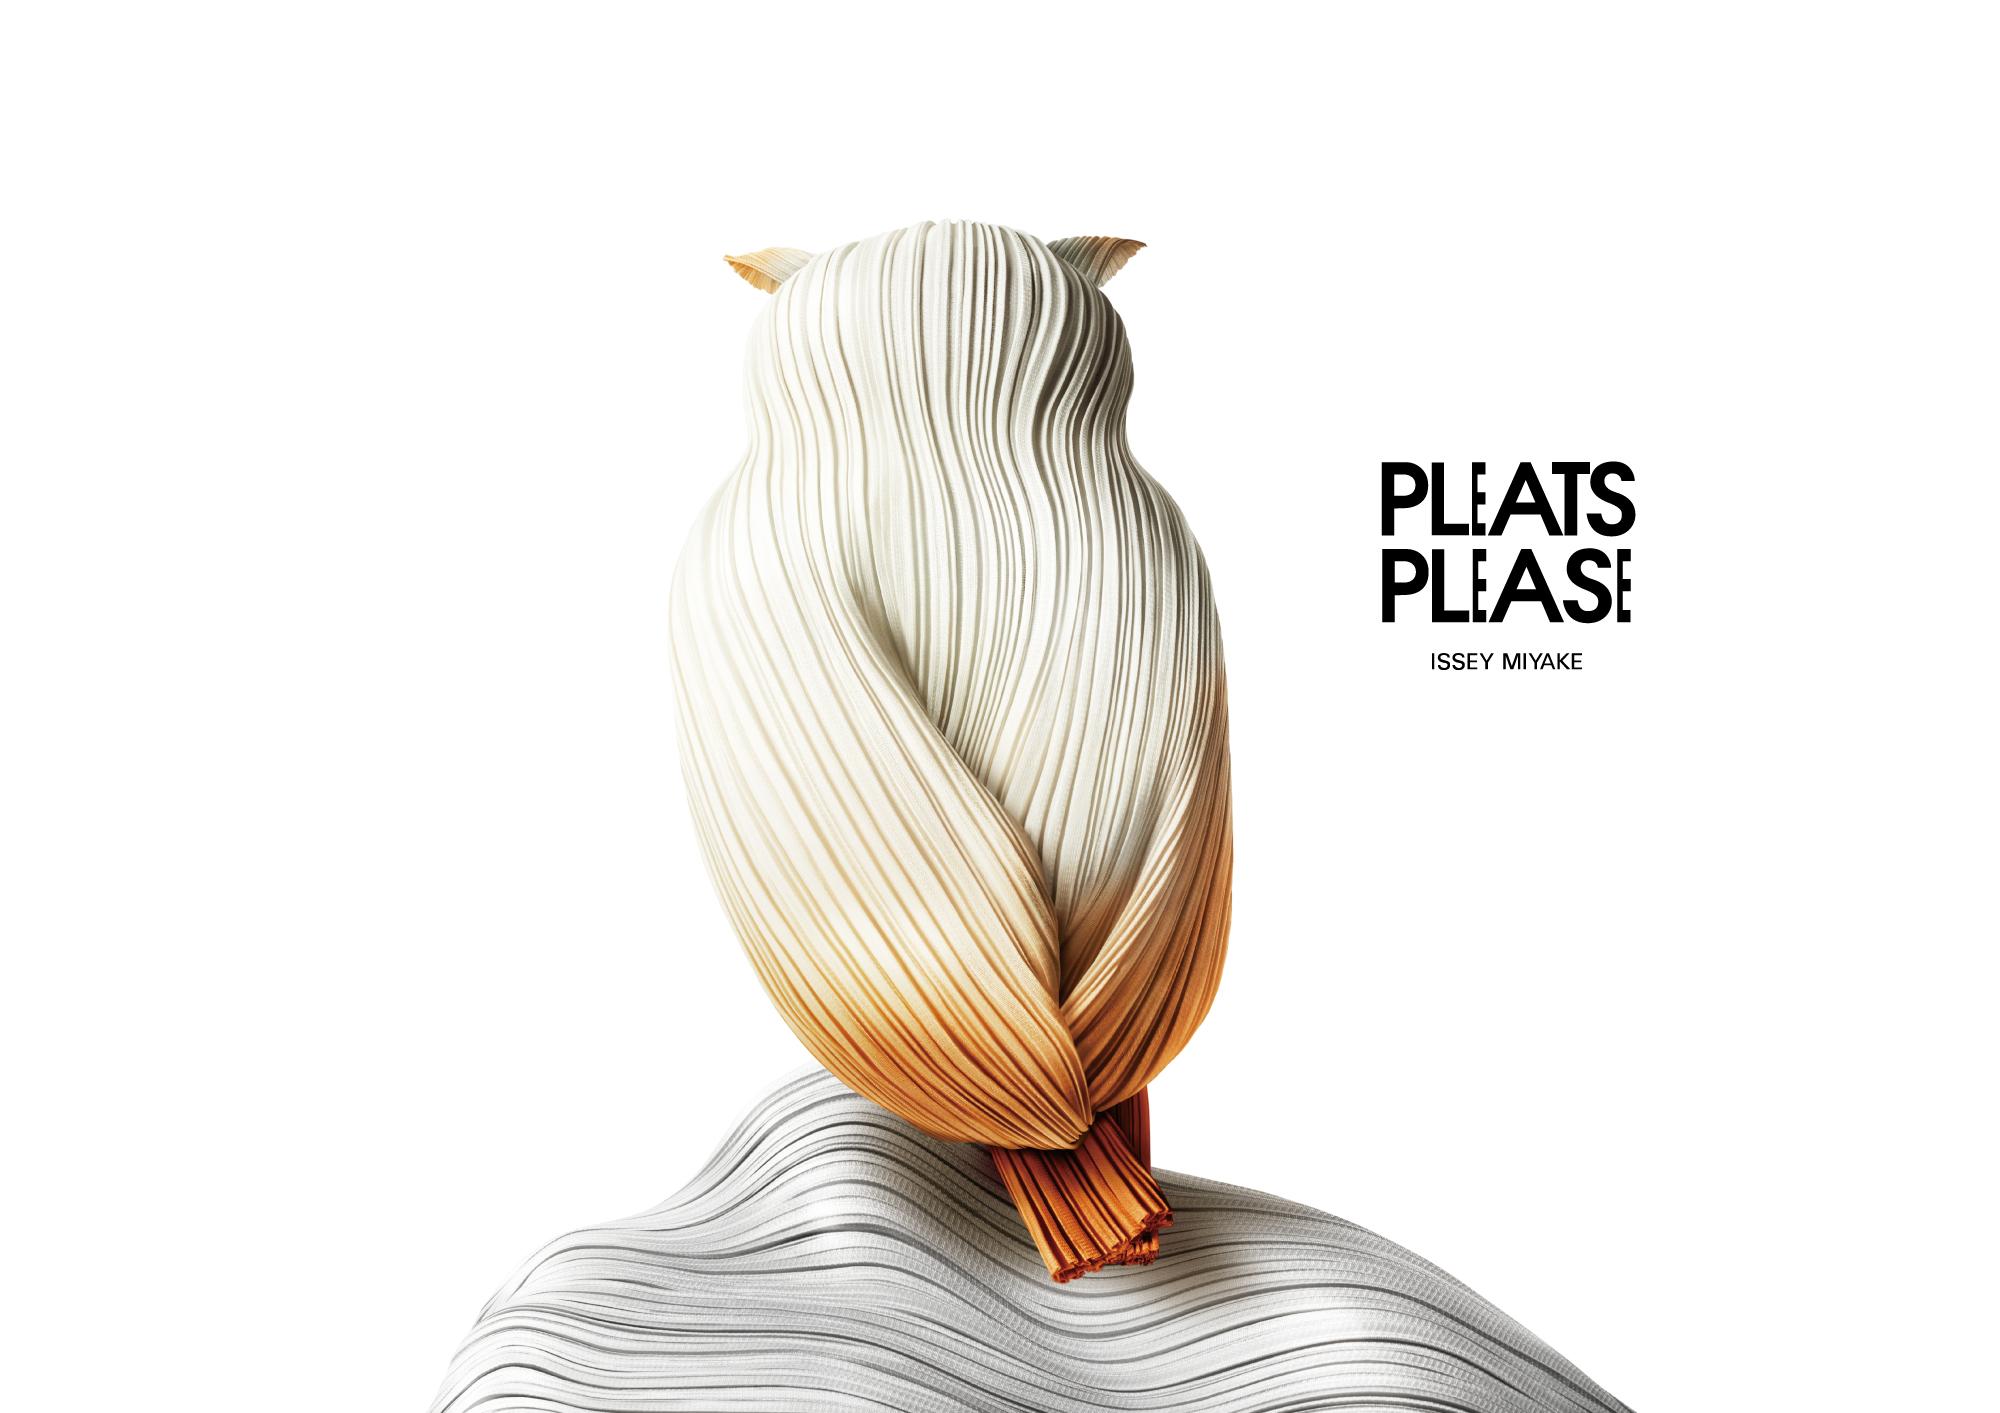 Pleats Please Issey Miyake